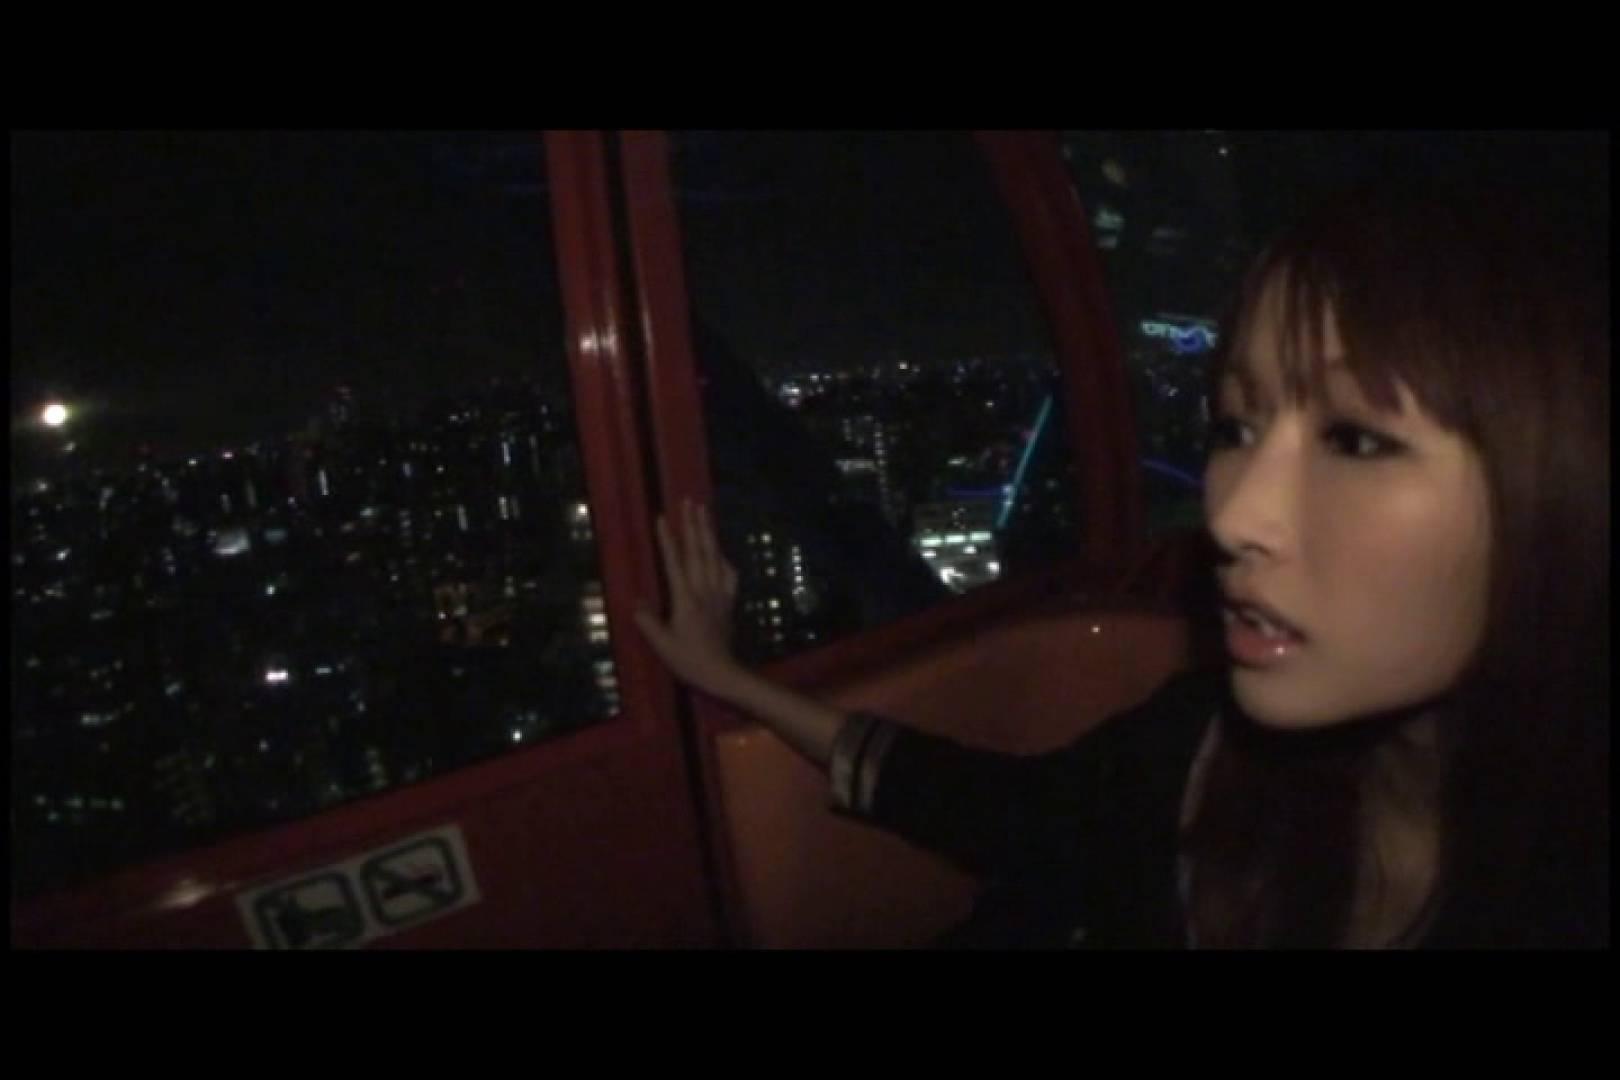 JDハンター全国ツアー vol.058 後編 女子大生のエロ動画 | 0  106PIX 37